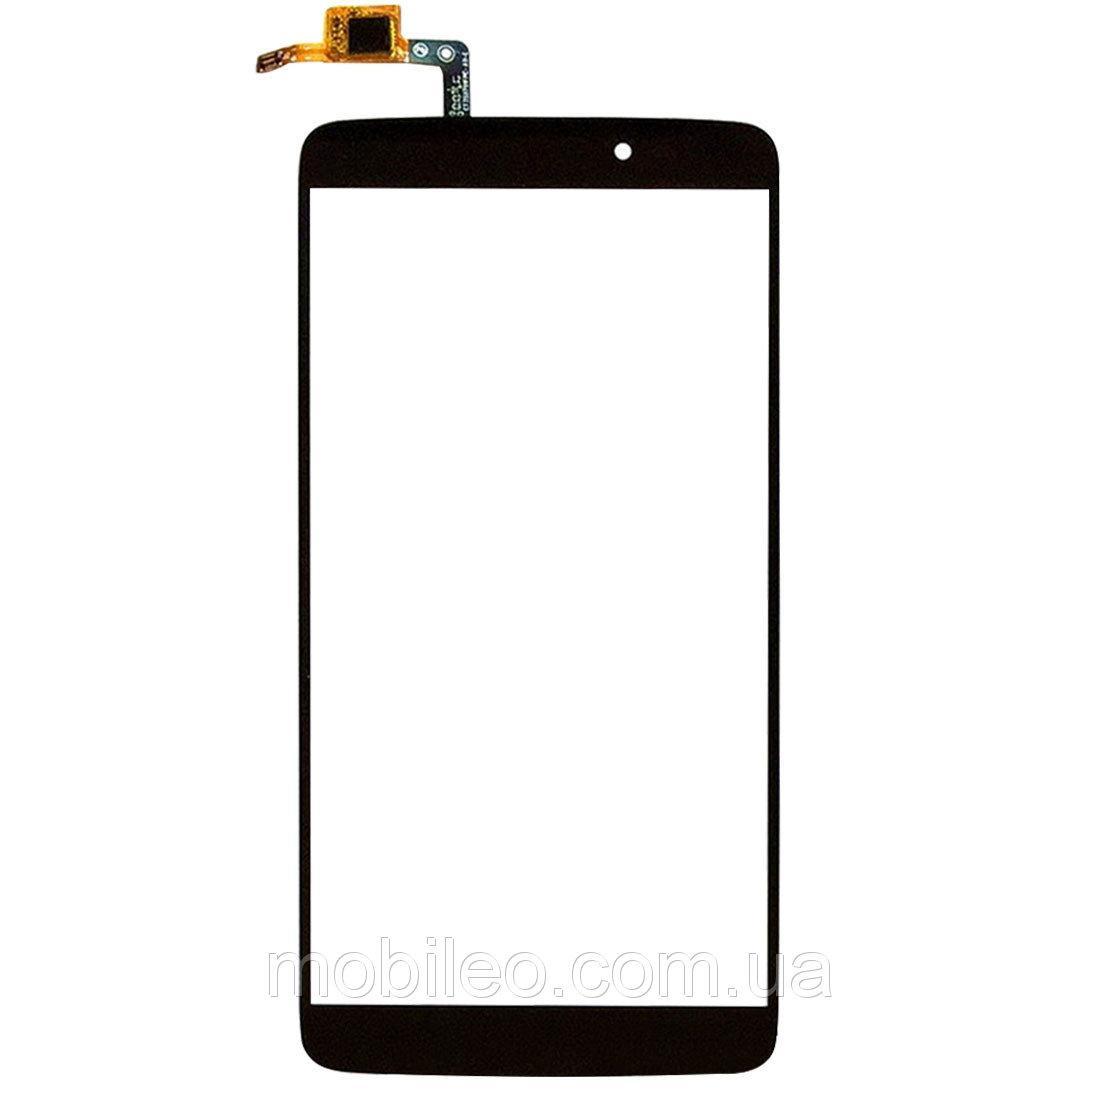 Сенсорный экран (тачскрин) Alcatel 6045I One Touch Idol 3 black